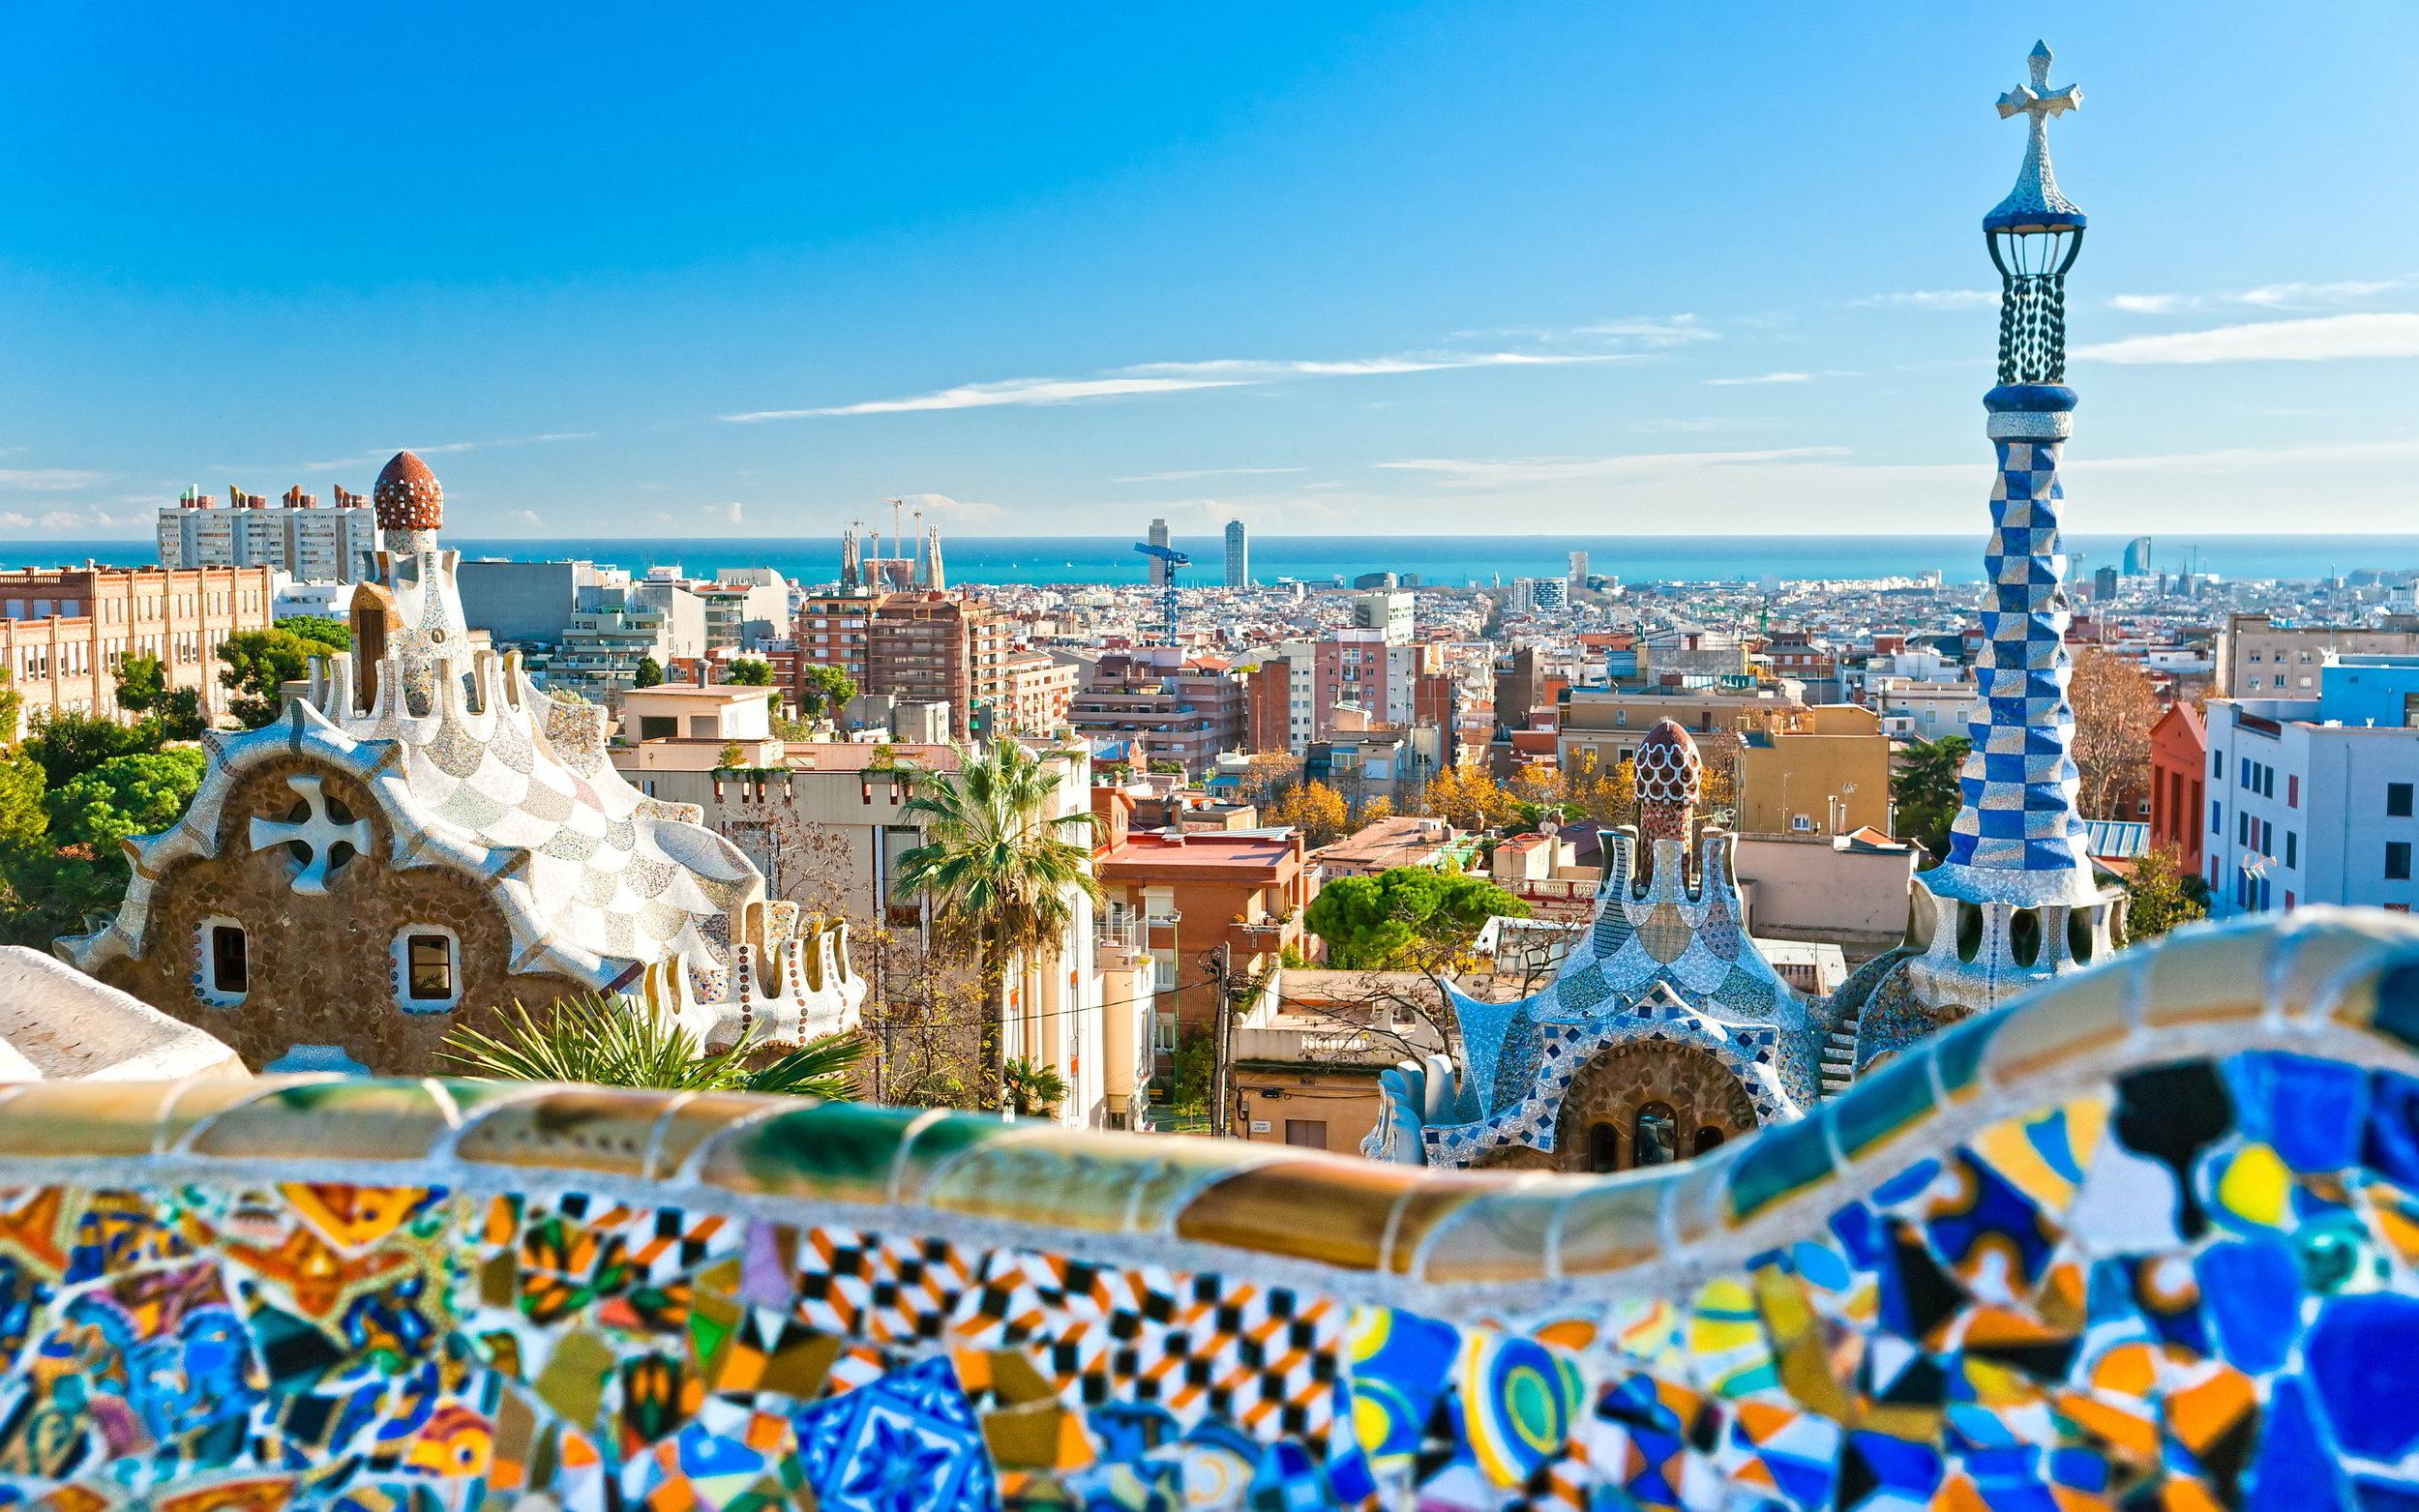 barcelona-spain - Copy.jpg